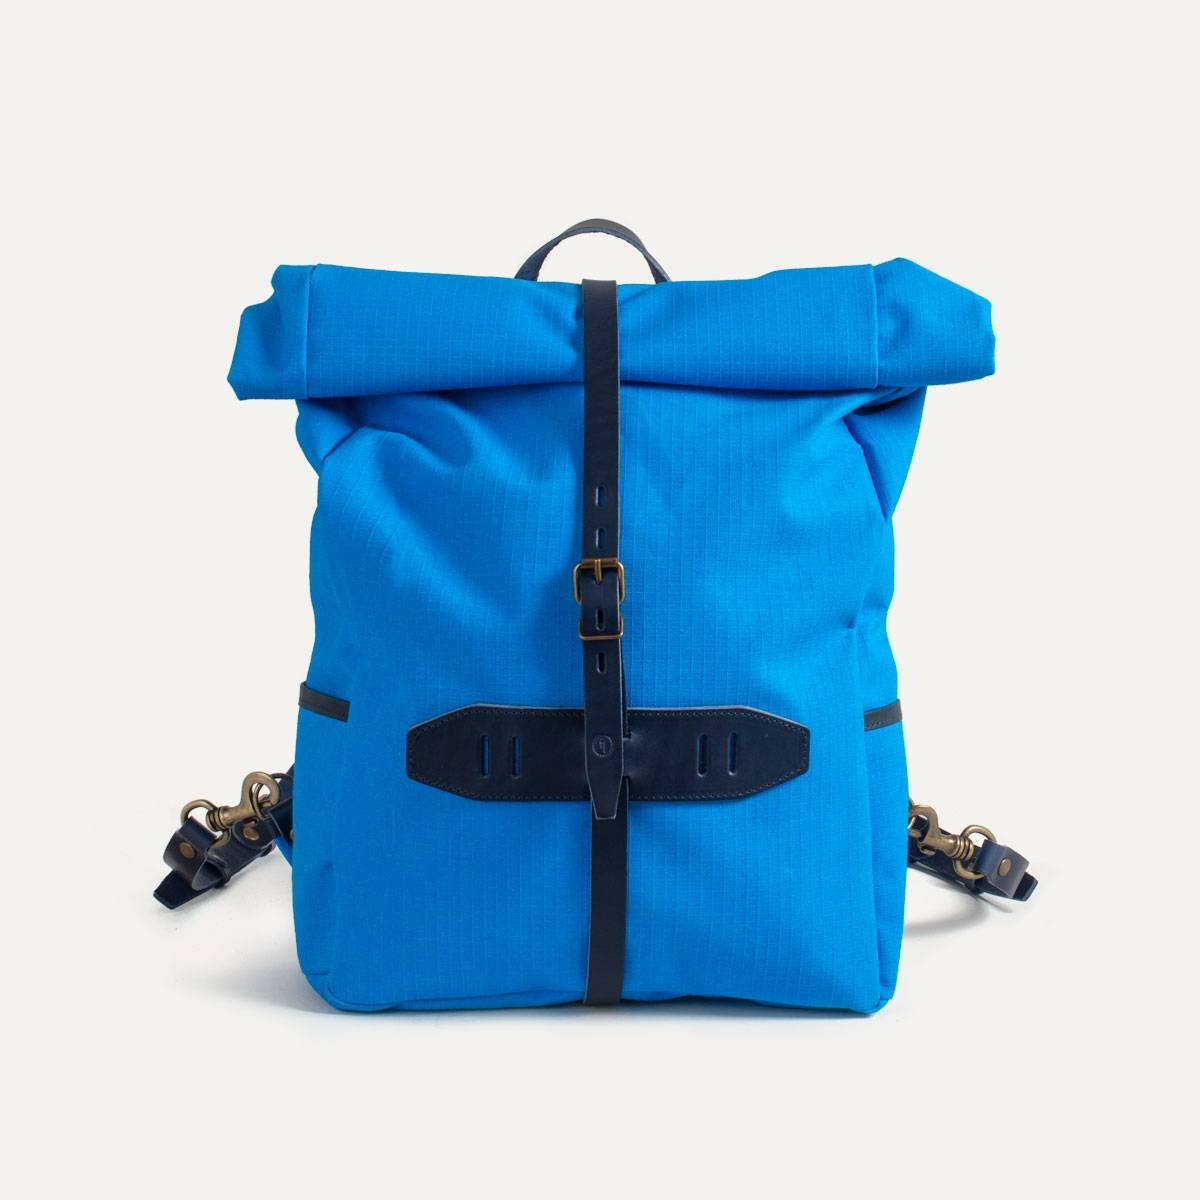 Jamy Backpack - Regentex Blue (image n°1)